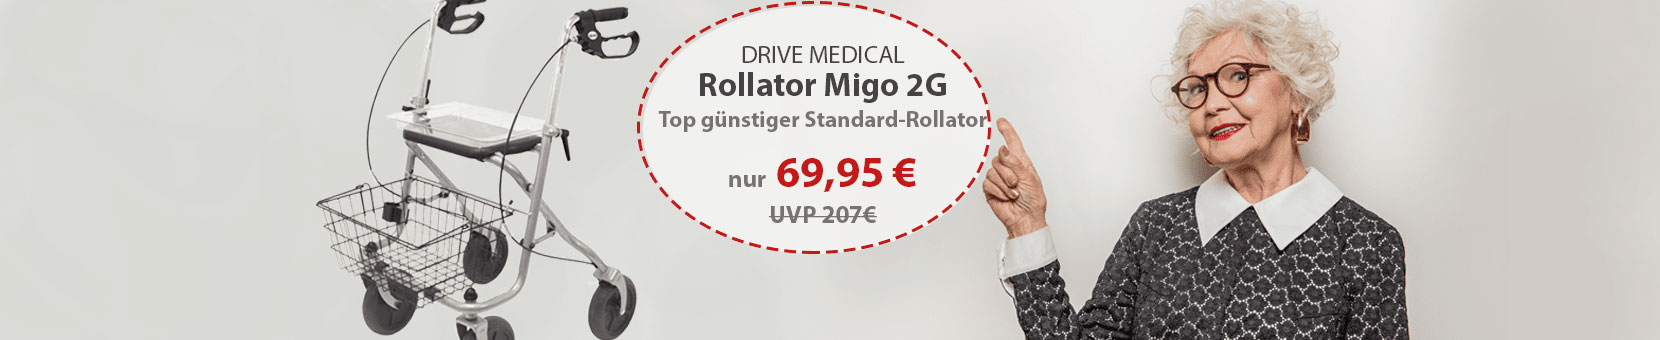 Banner Drive Medical Rollator Migo 2G